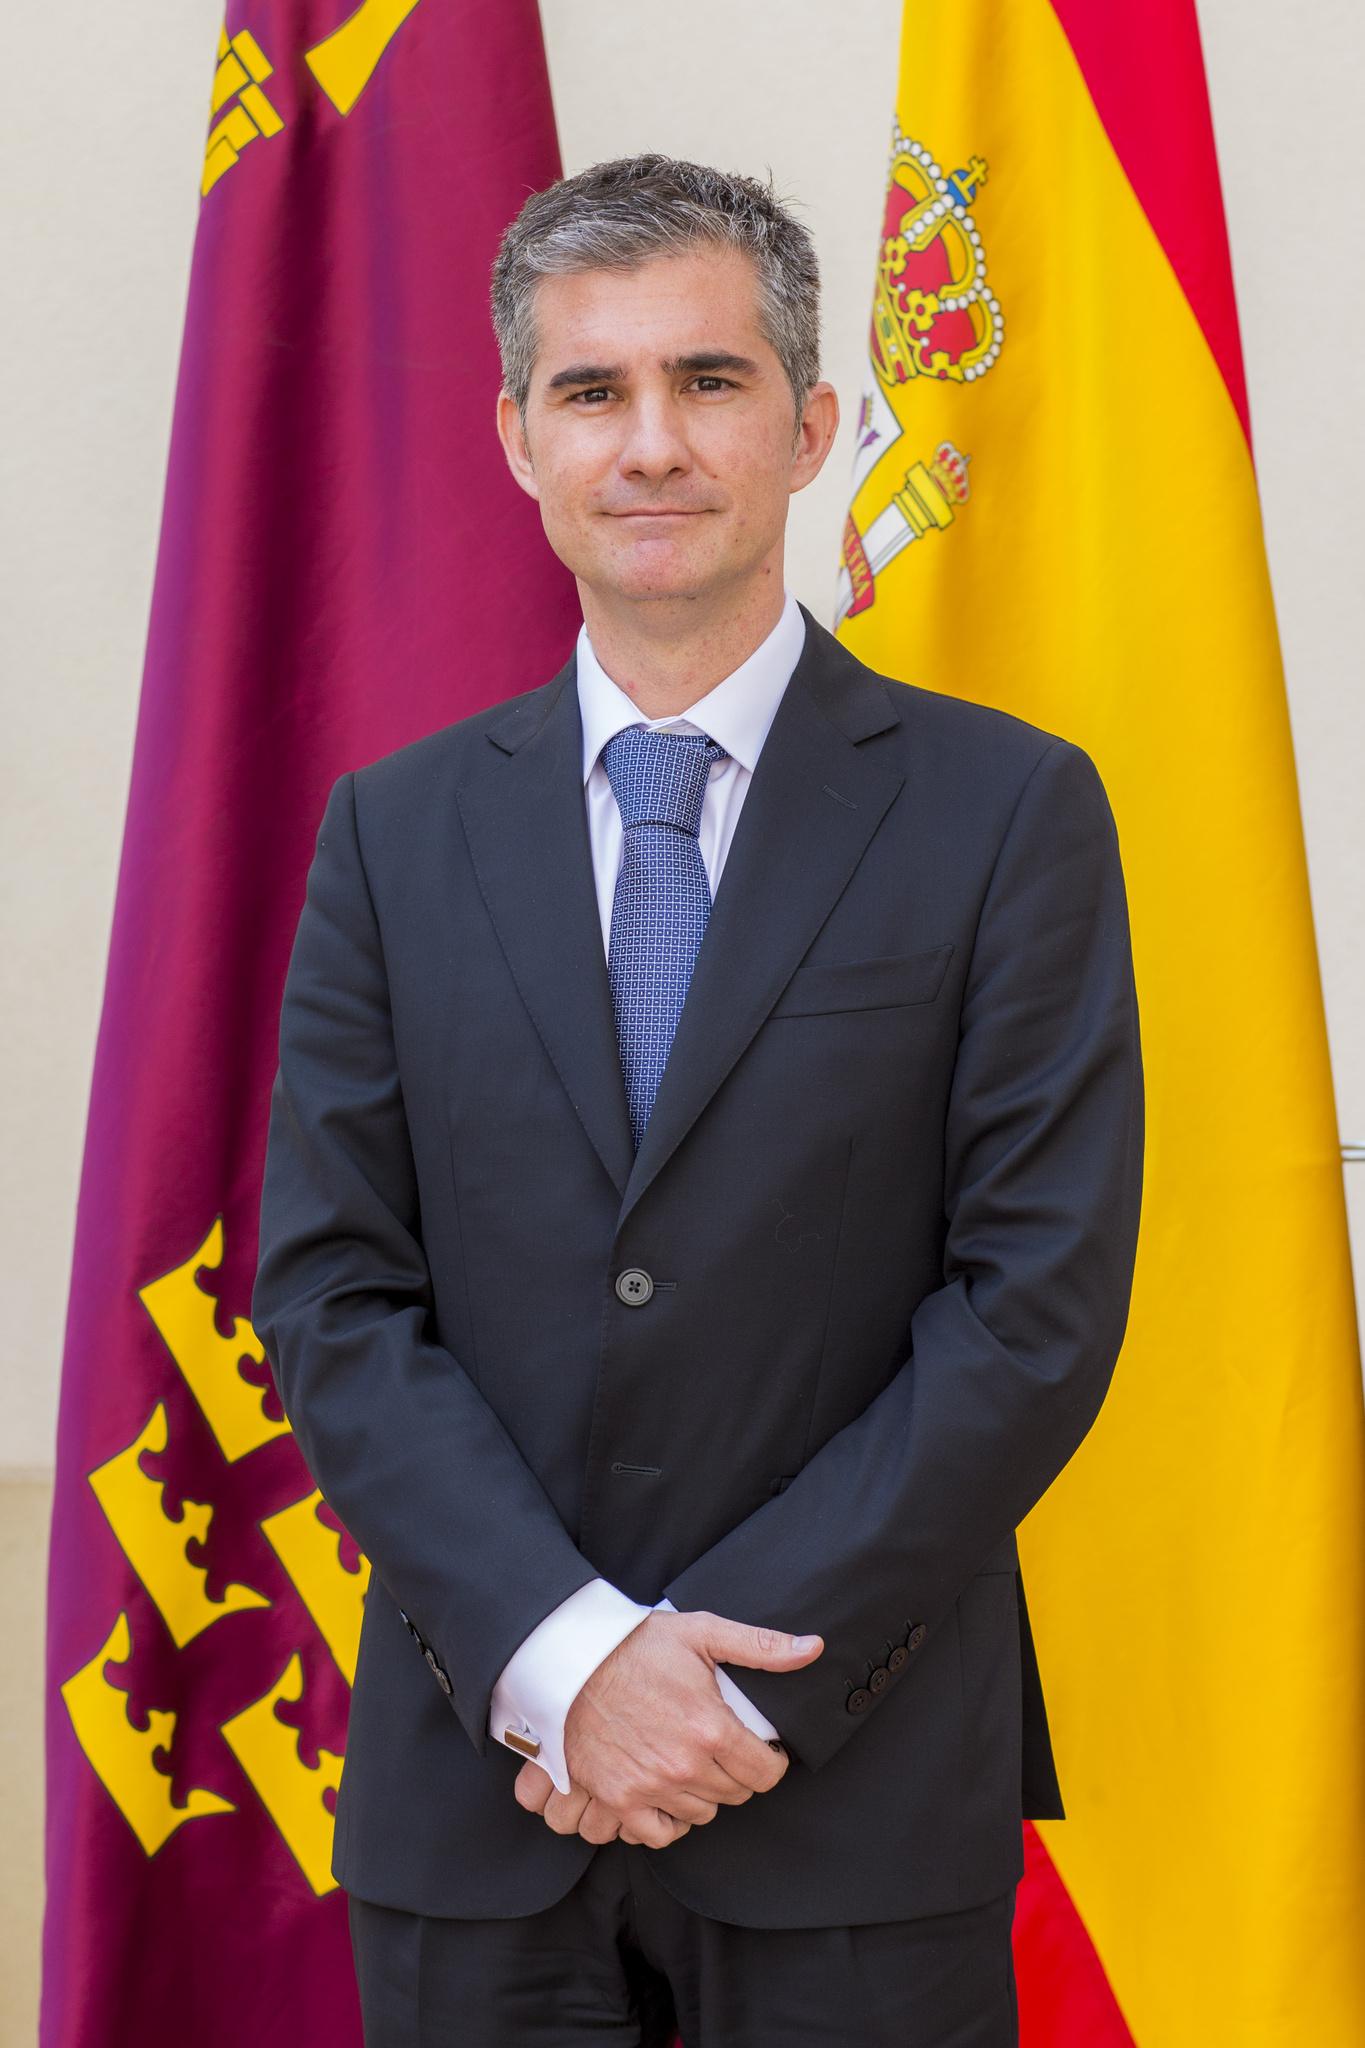 Miguel Ángel del Amor Saavedra